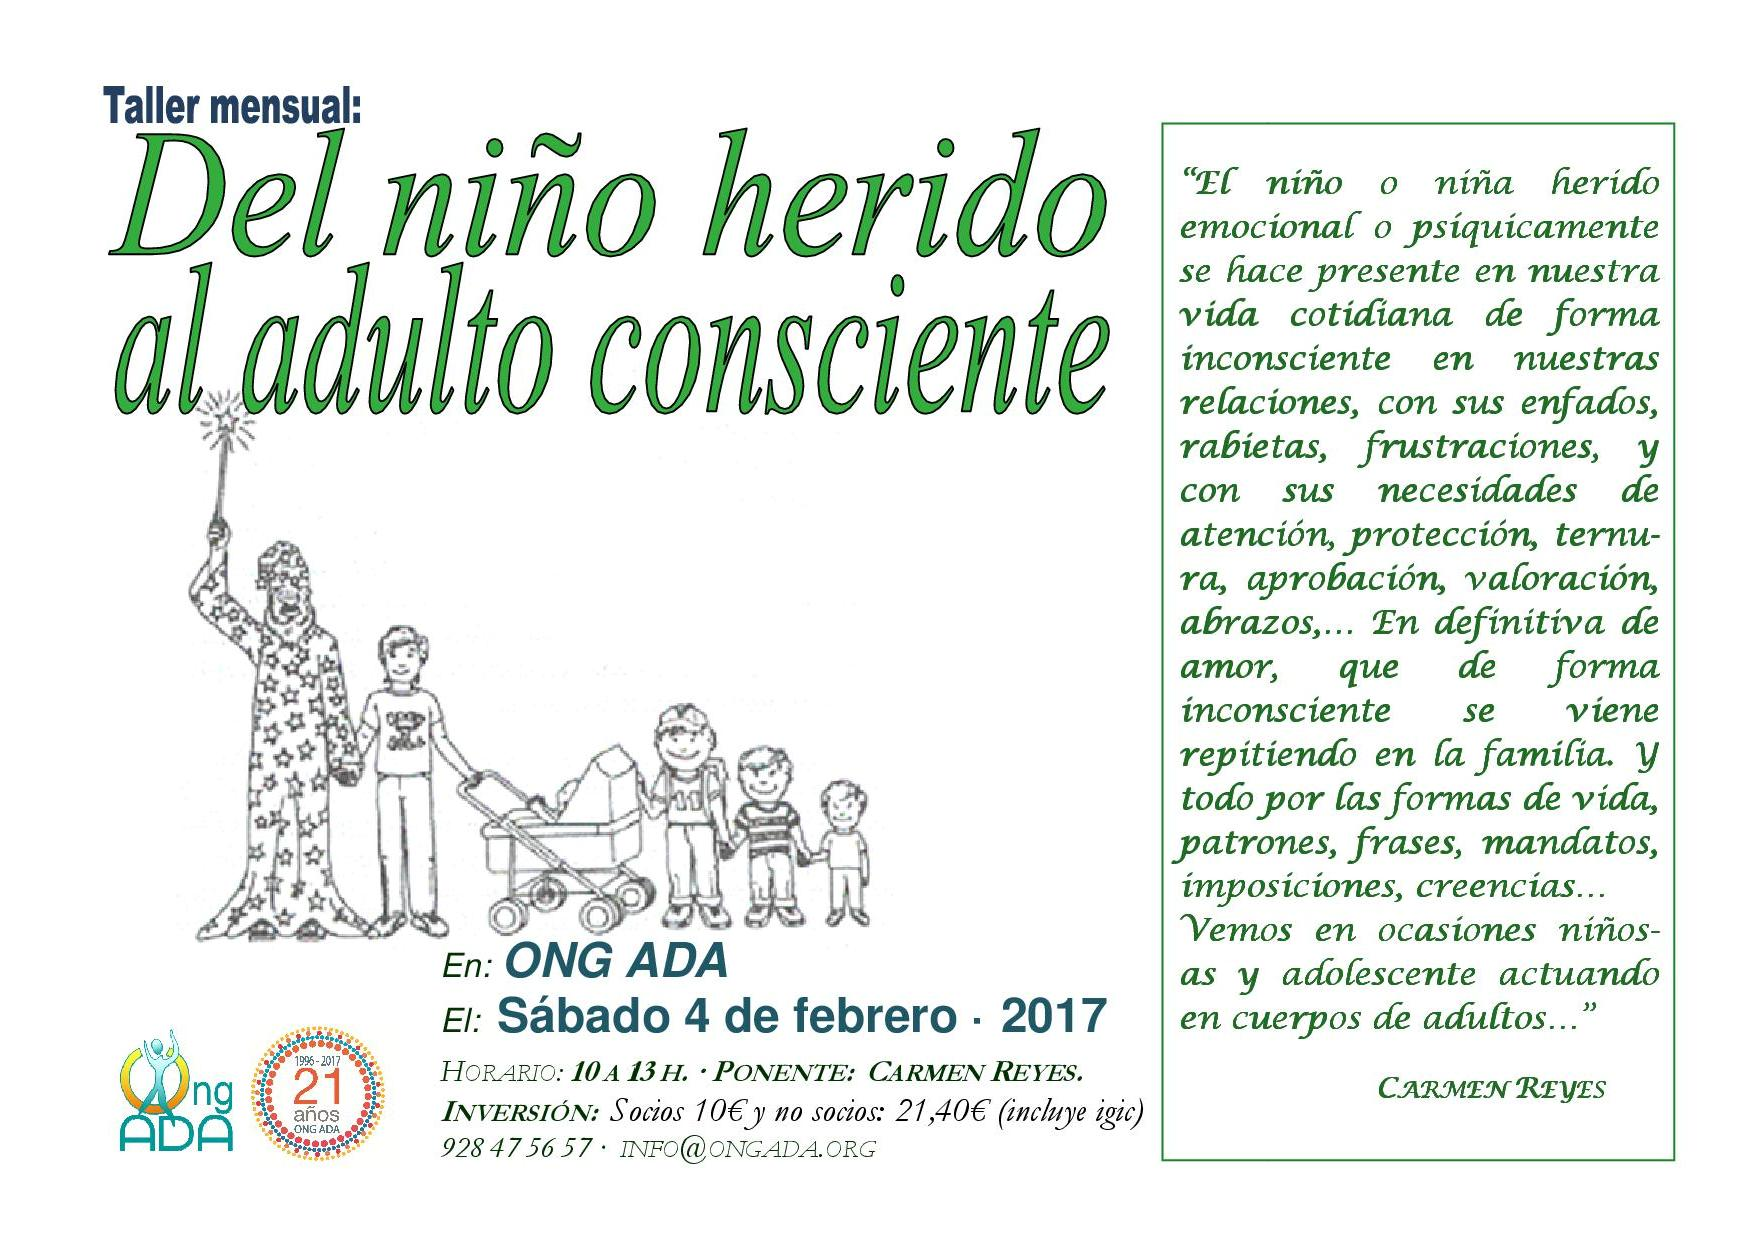 Taller_Mensual_2017._Del_niño_herido...RED